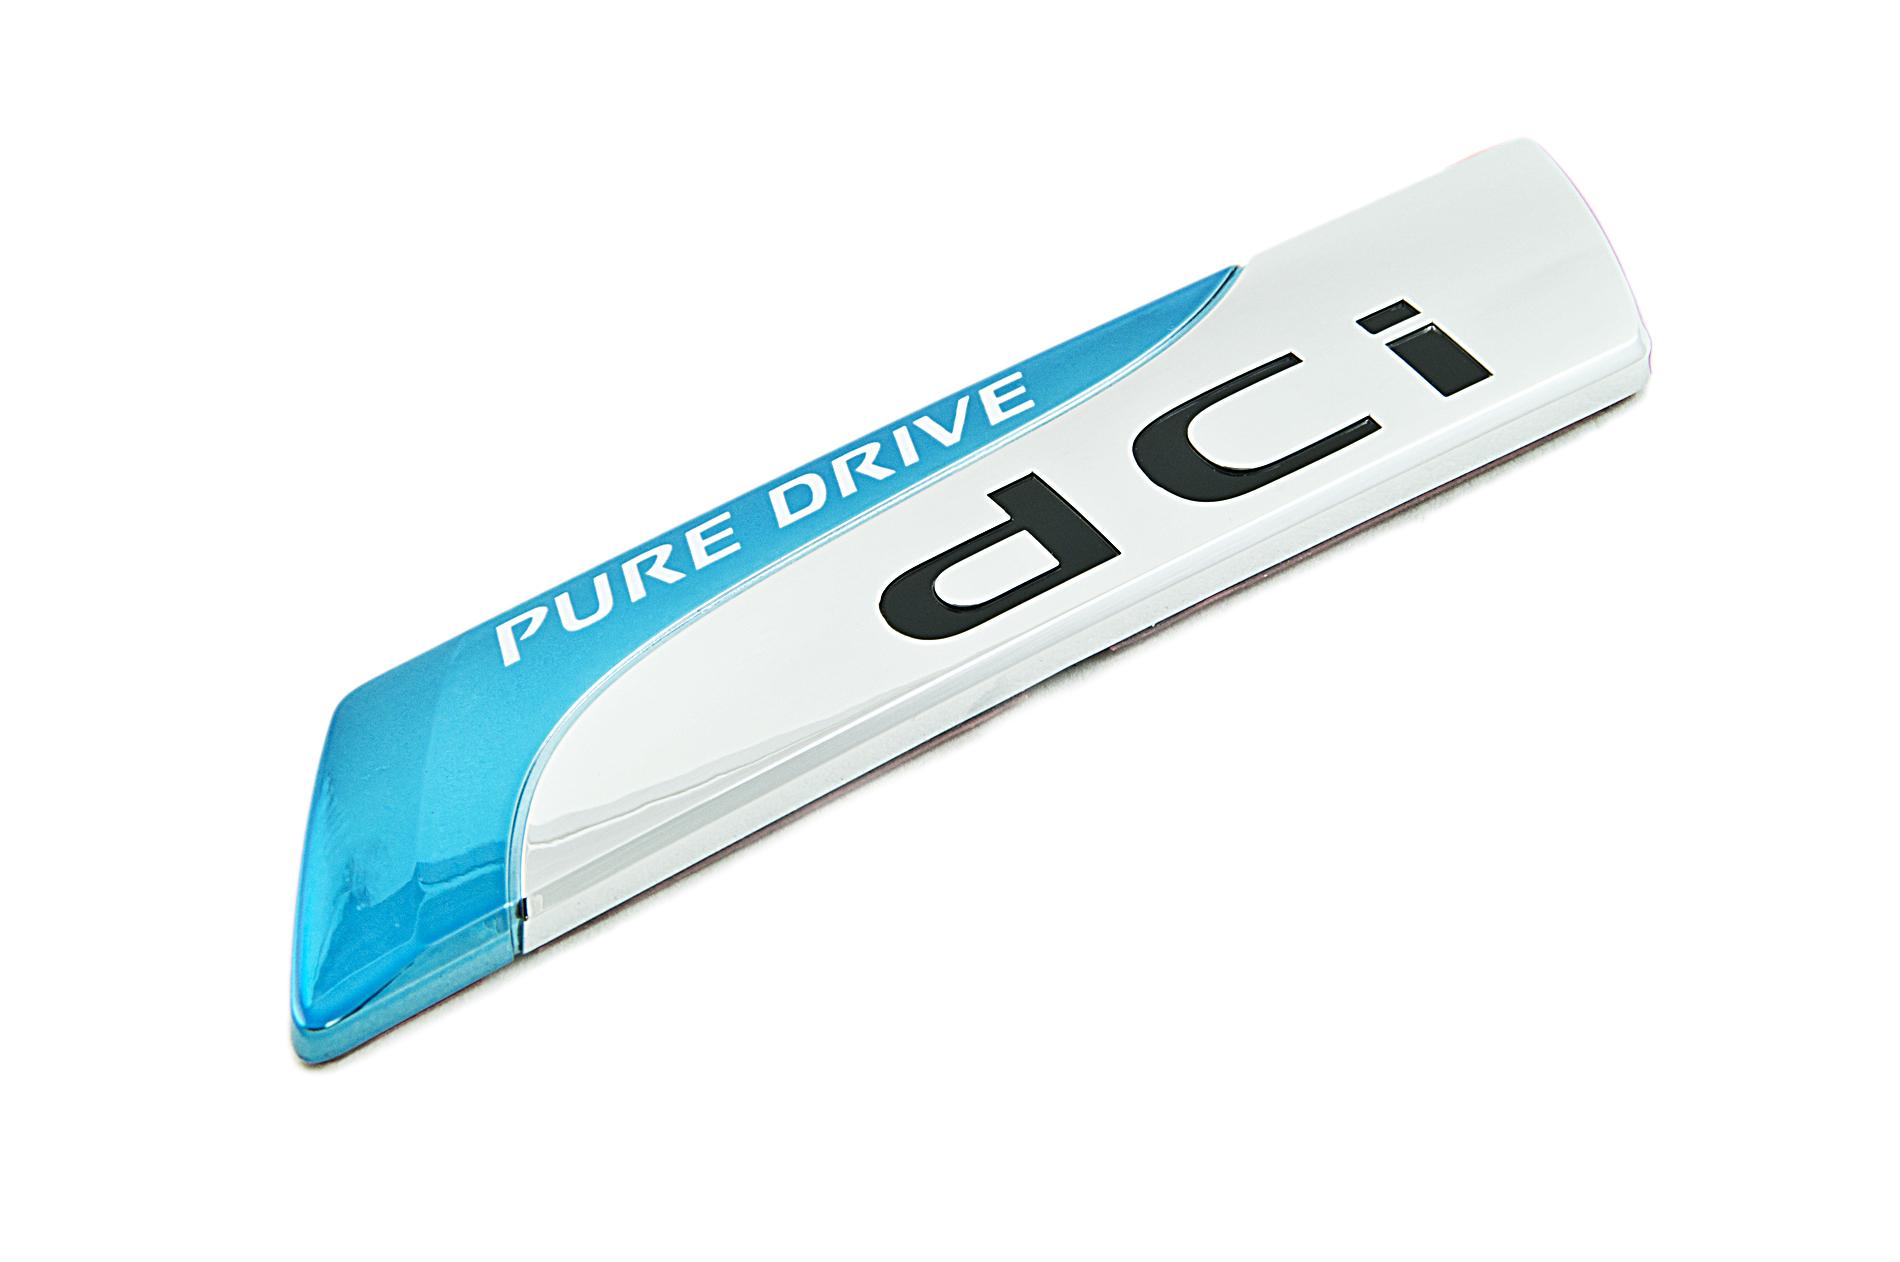 nissan genuine pure drive dci badge emblem rear for boot. Black Bedroom Furniture Sets. Home Design Ideas